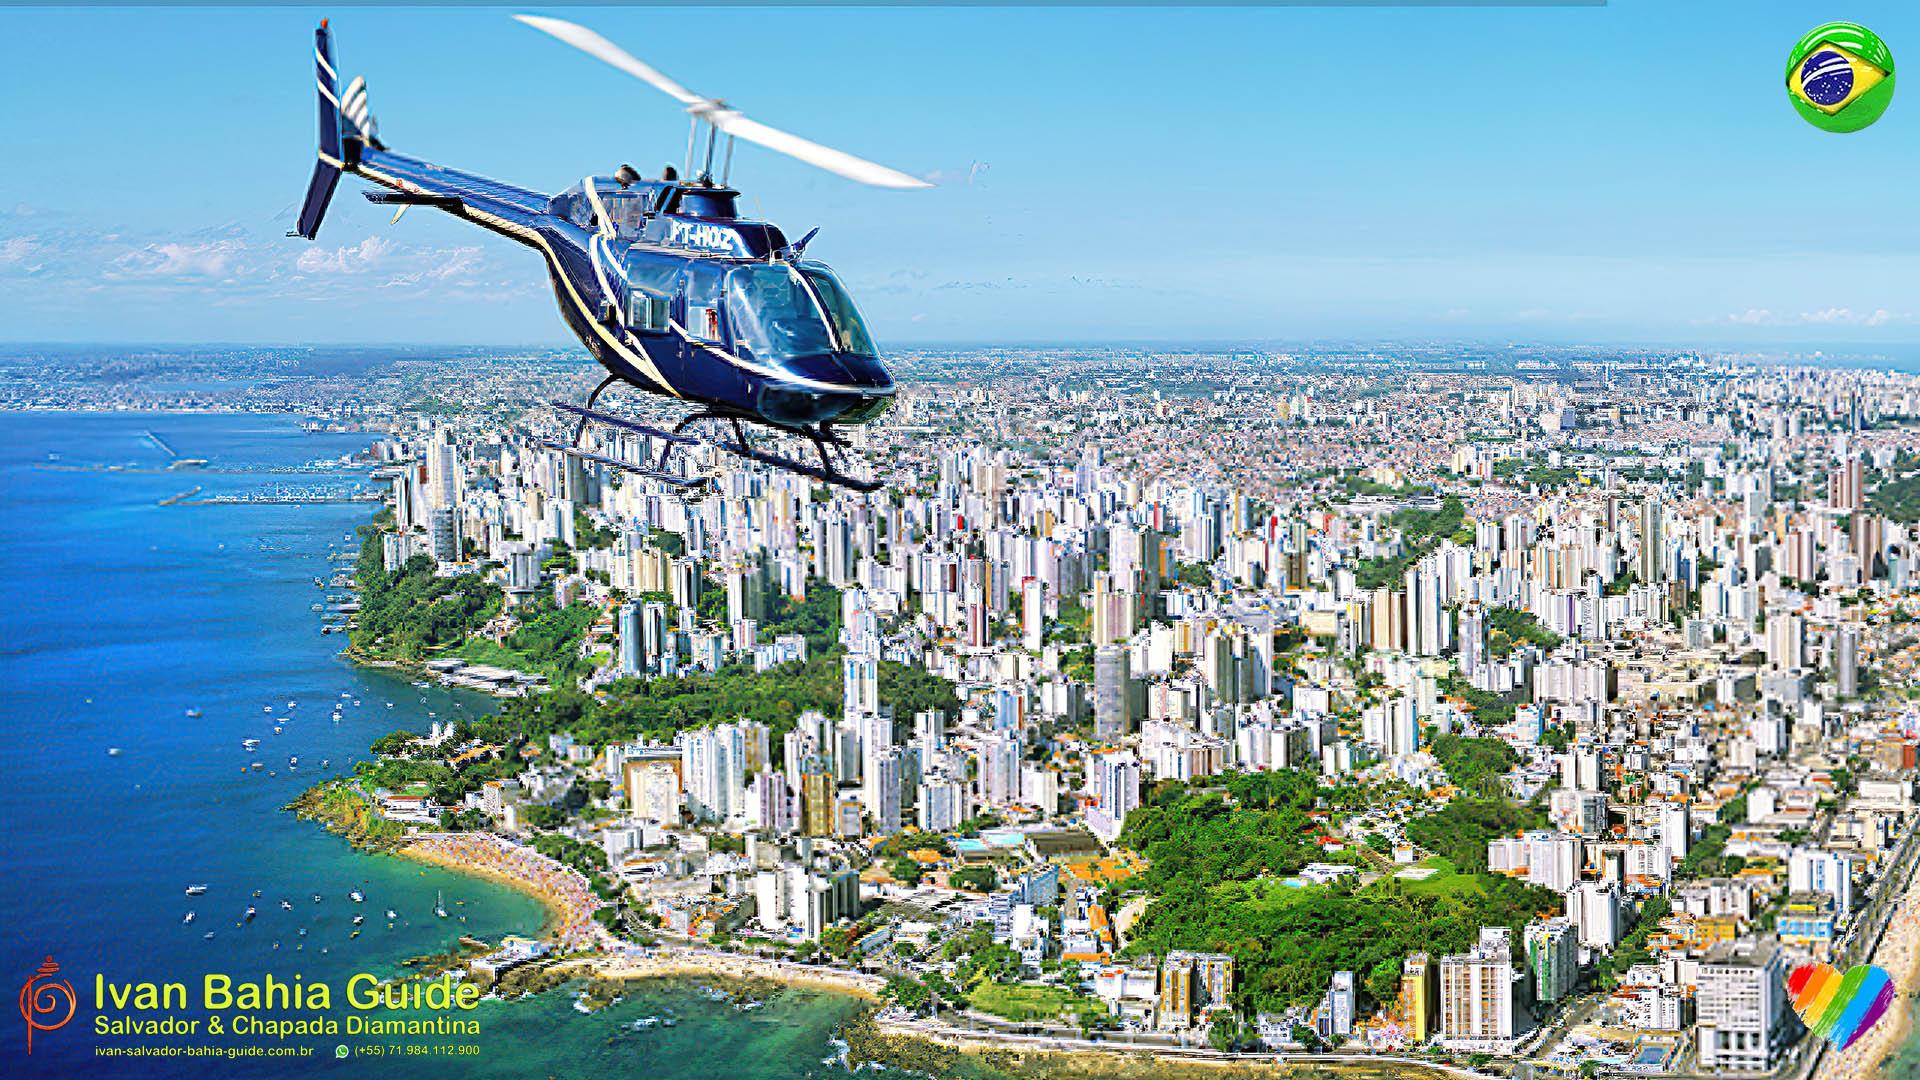 Panoramic Helicopter flights above Salvador da Bahia & Helicopter transfers to Morro de São Paulo and Boipeba islands, or Chapada Diamantina National Park, organized Ivan Bahia Guide Chapada Diamantina Brazil